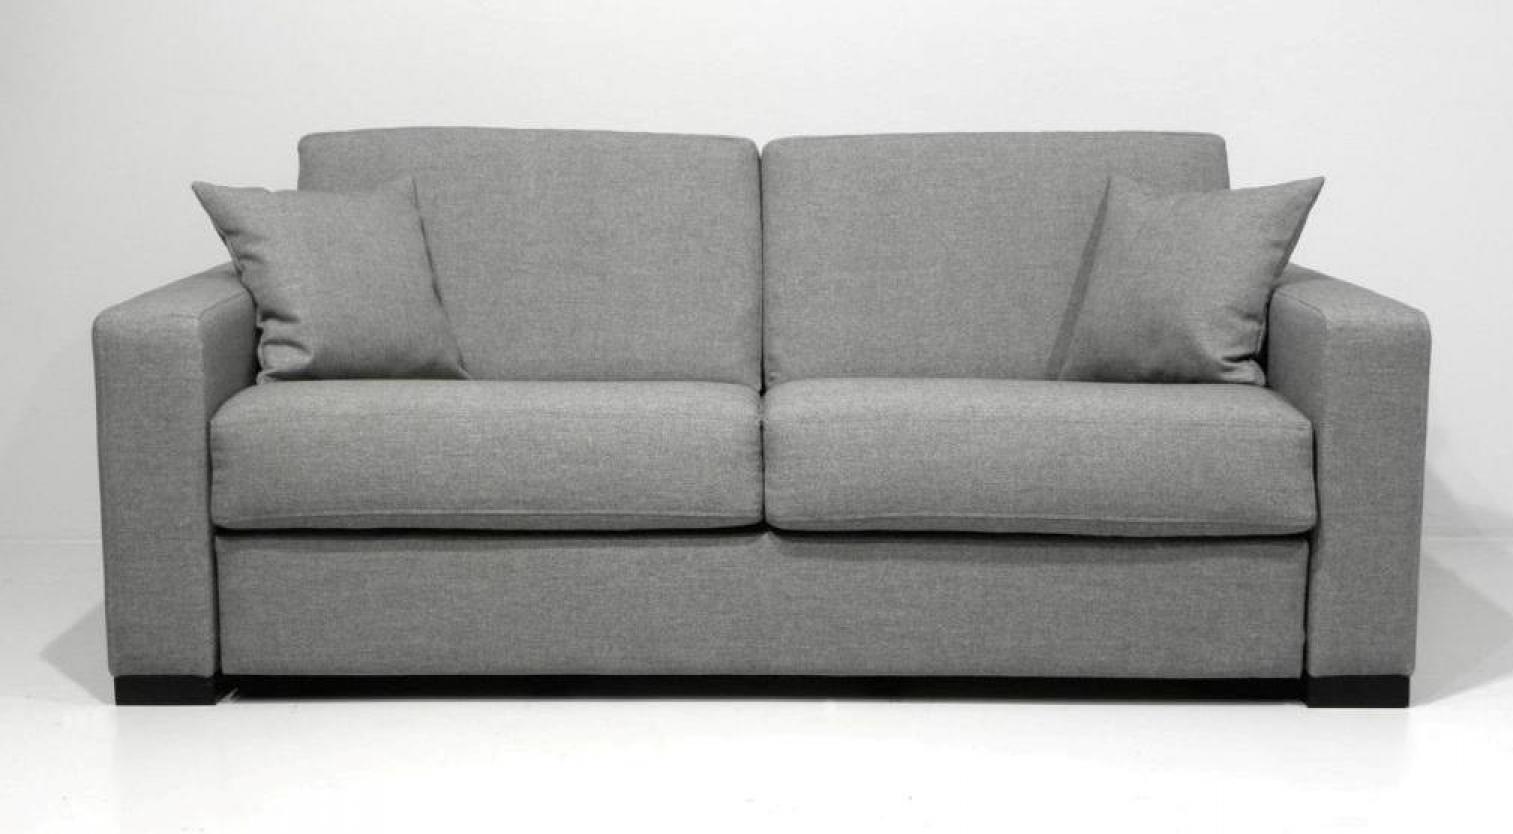 photos canap gris clair convertible. Black Bedroom Furniture Sets. Home Design Ideas